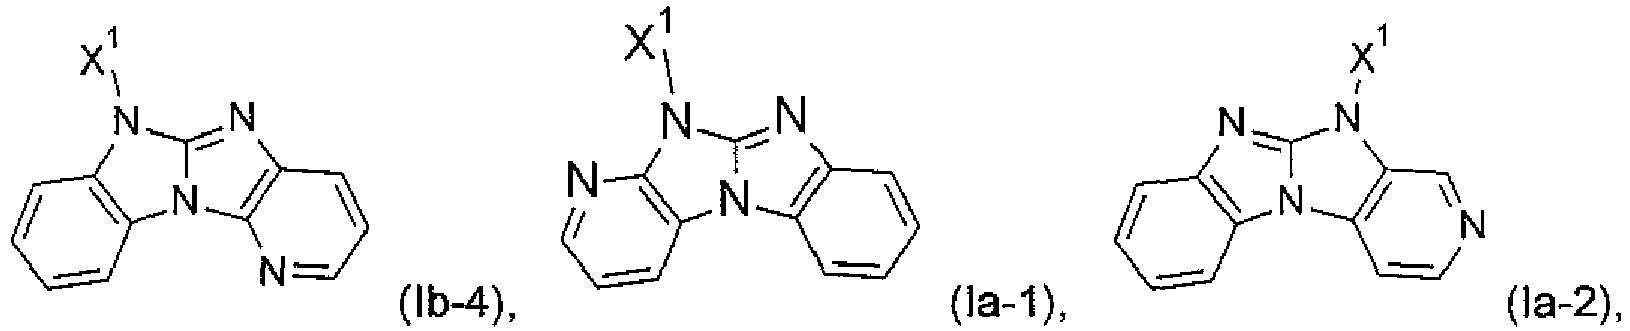 Figure imgb0736